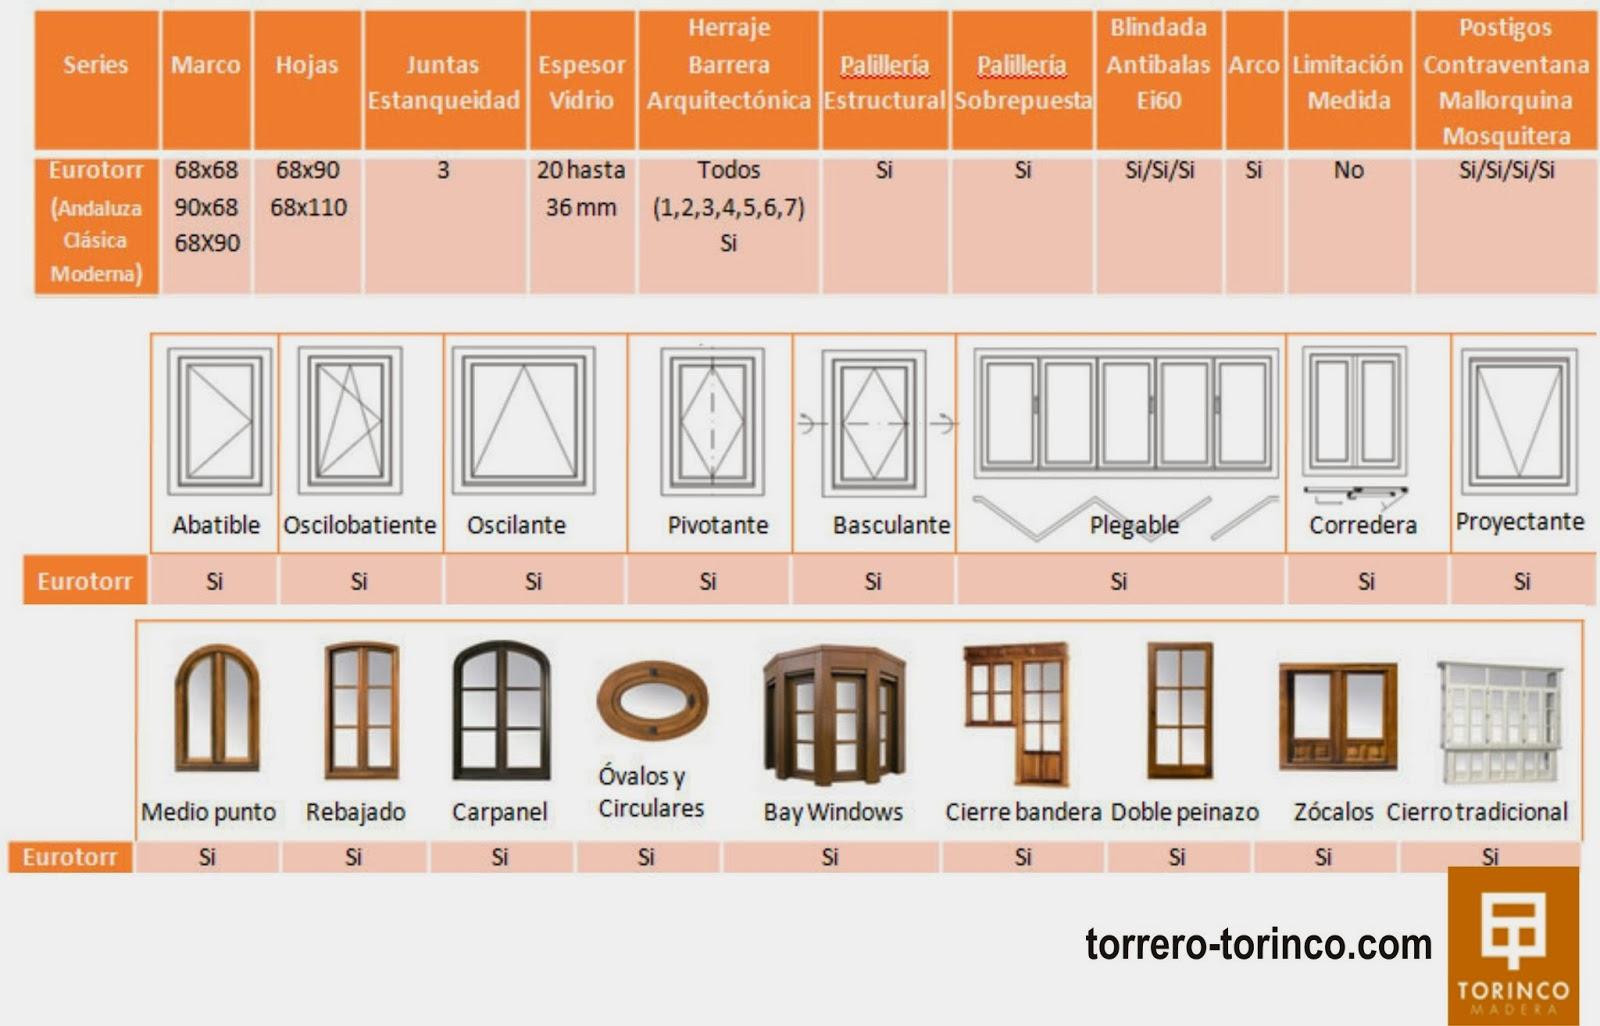 Casa de este alojamiento ventanas de madera a medida la plata for Medidas estandar de ventanas argentina